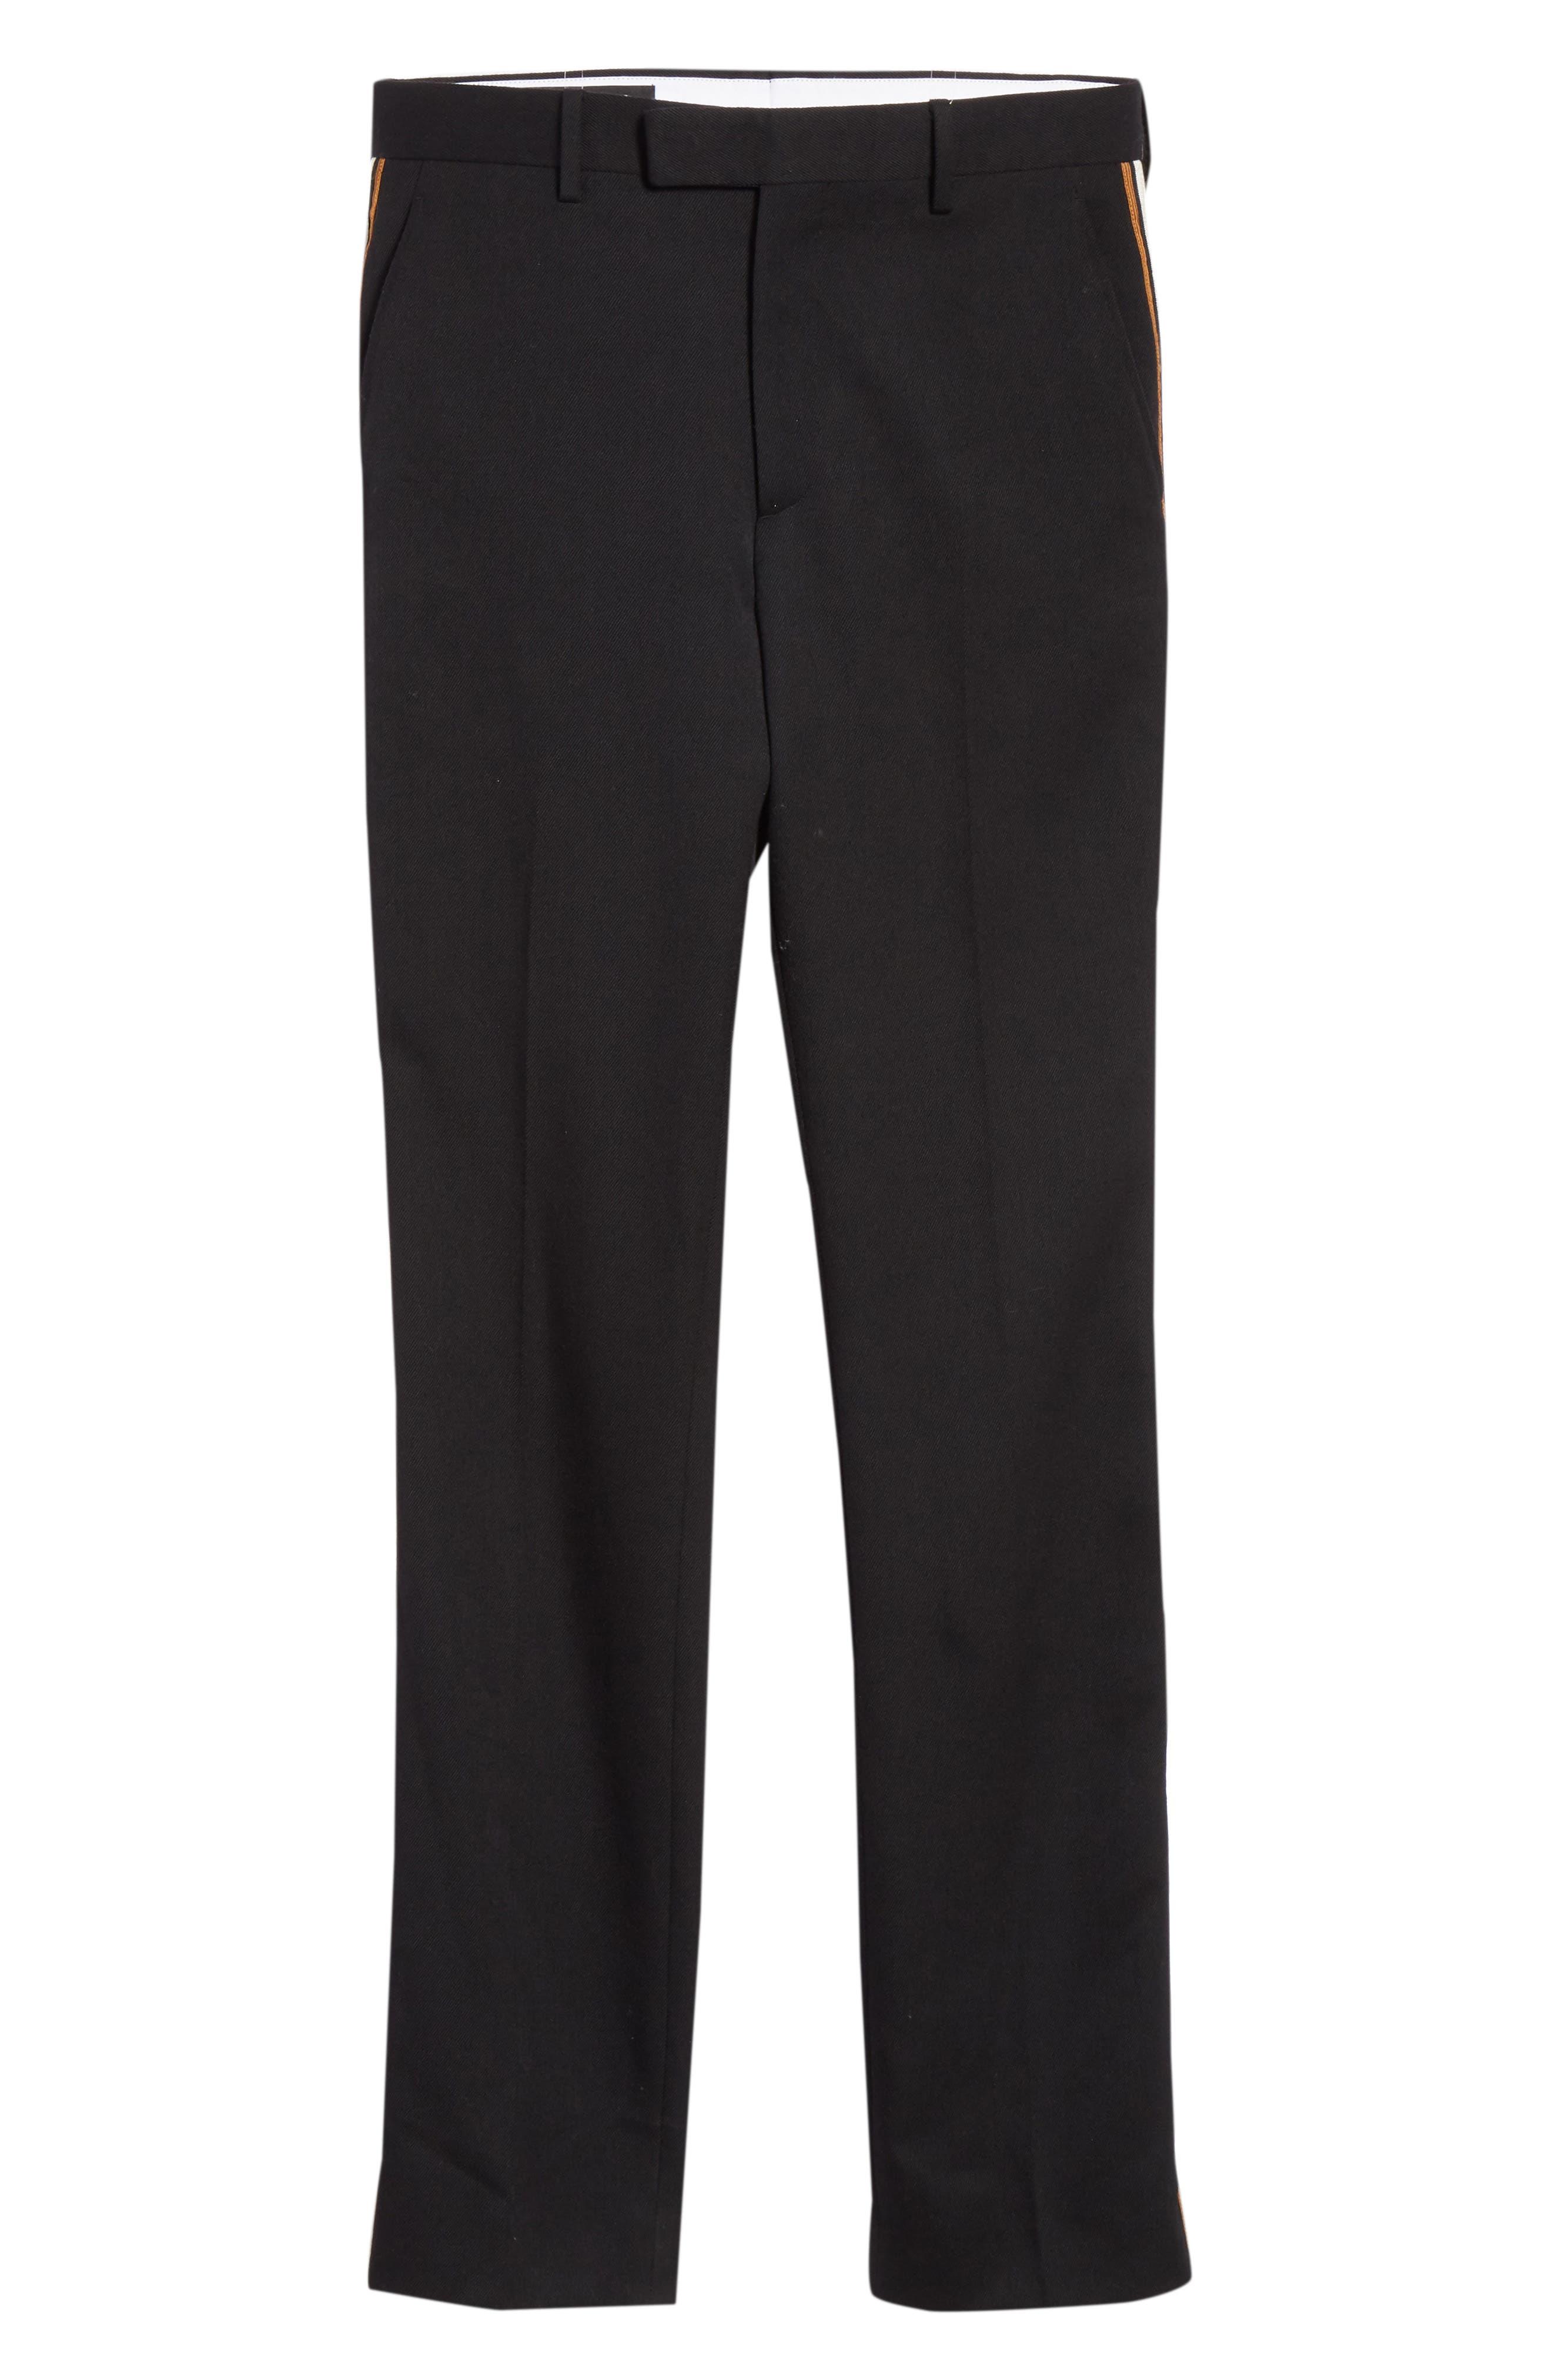 CALVIN KLEIN 205W39NYC,                             Uniform Stripe Trousers,                             Alternate thumbnail 6, color,                             060